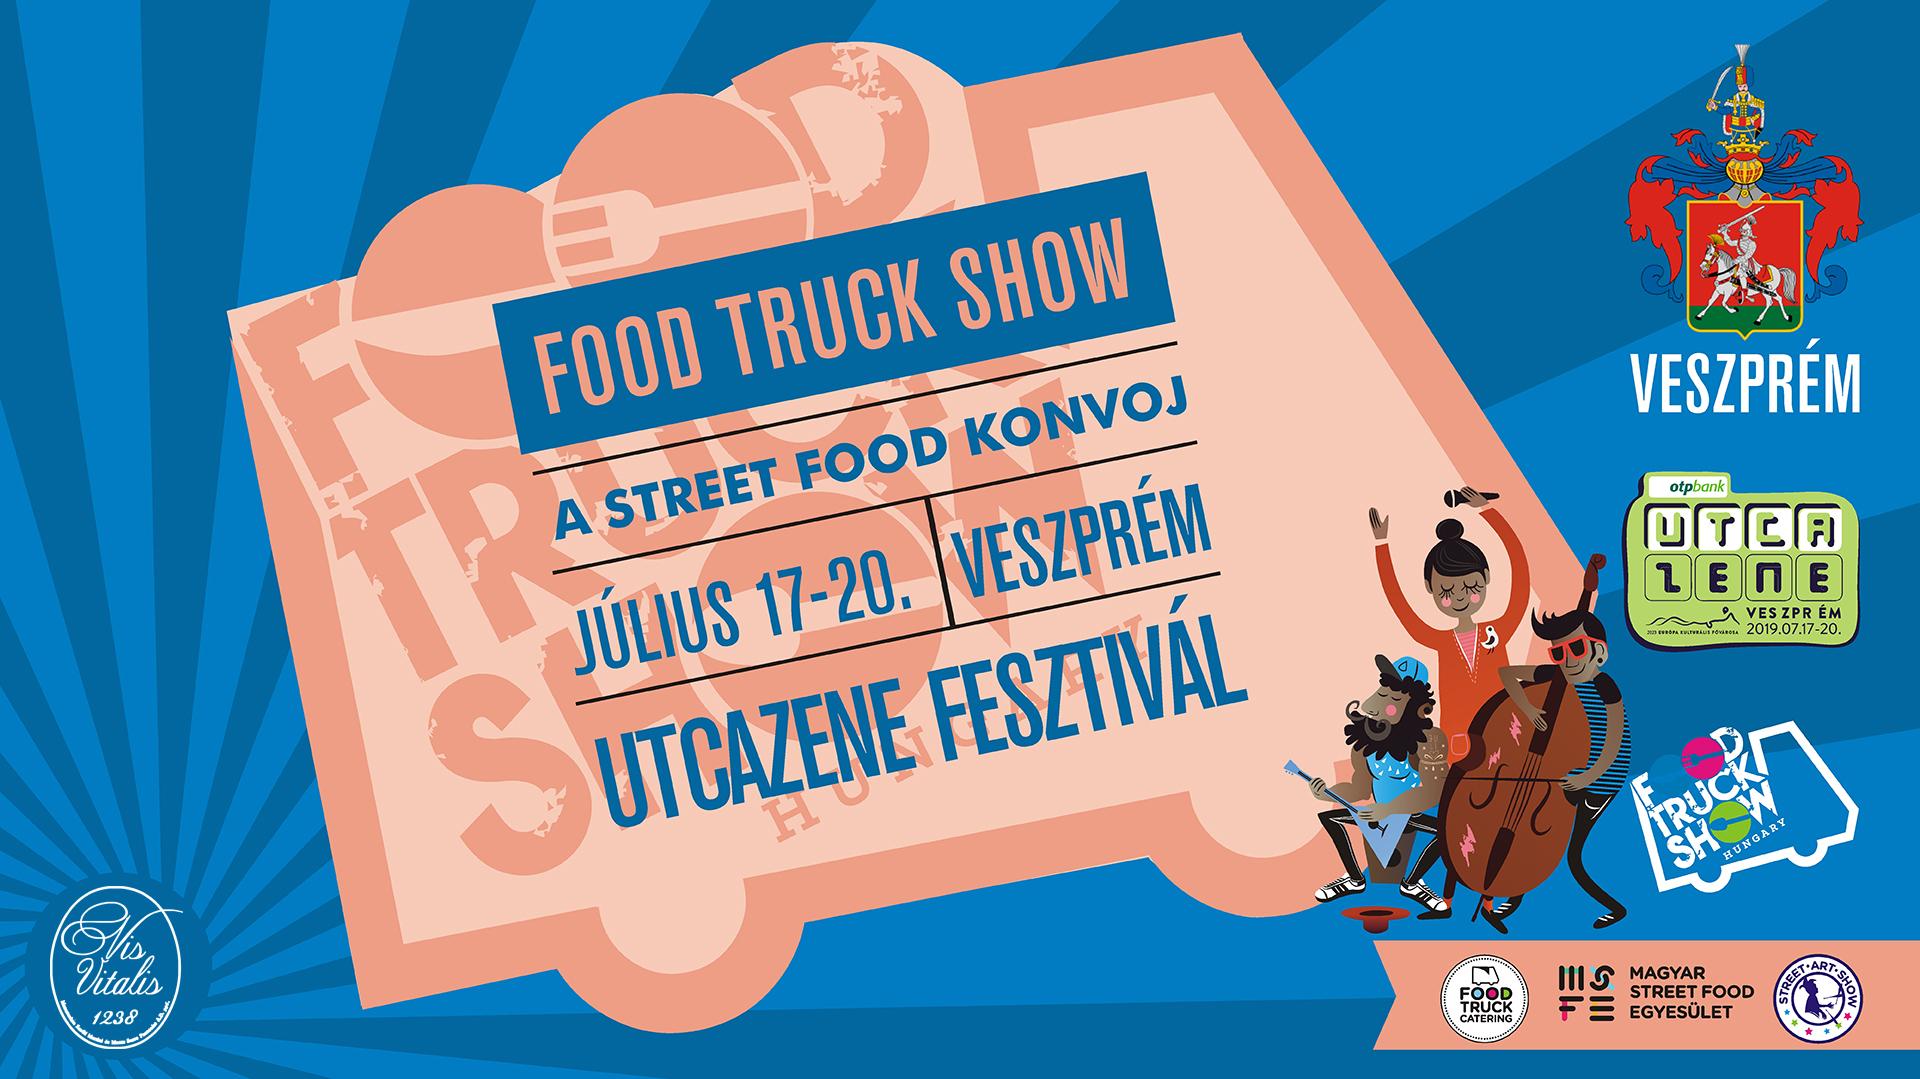 Food Truck Show Veszprém, főkép